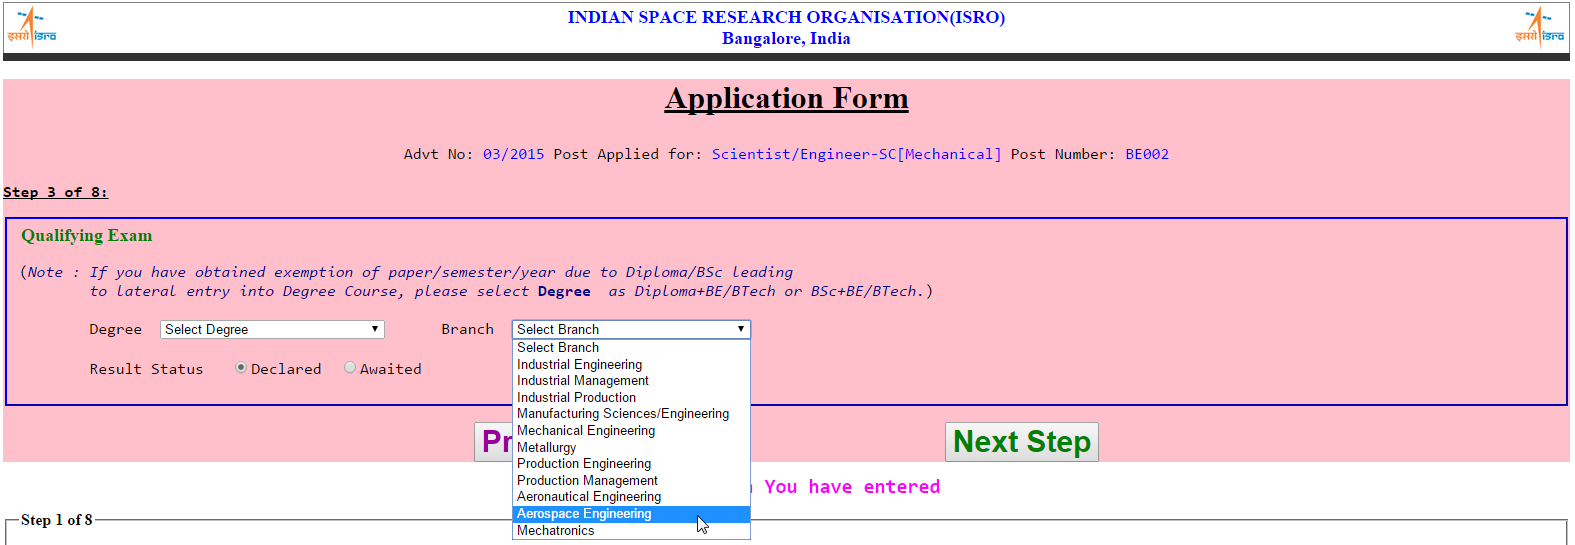 isro-me-eligibility